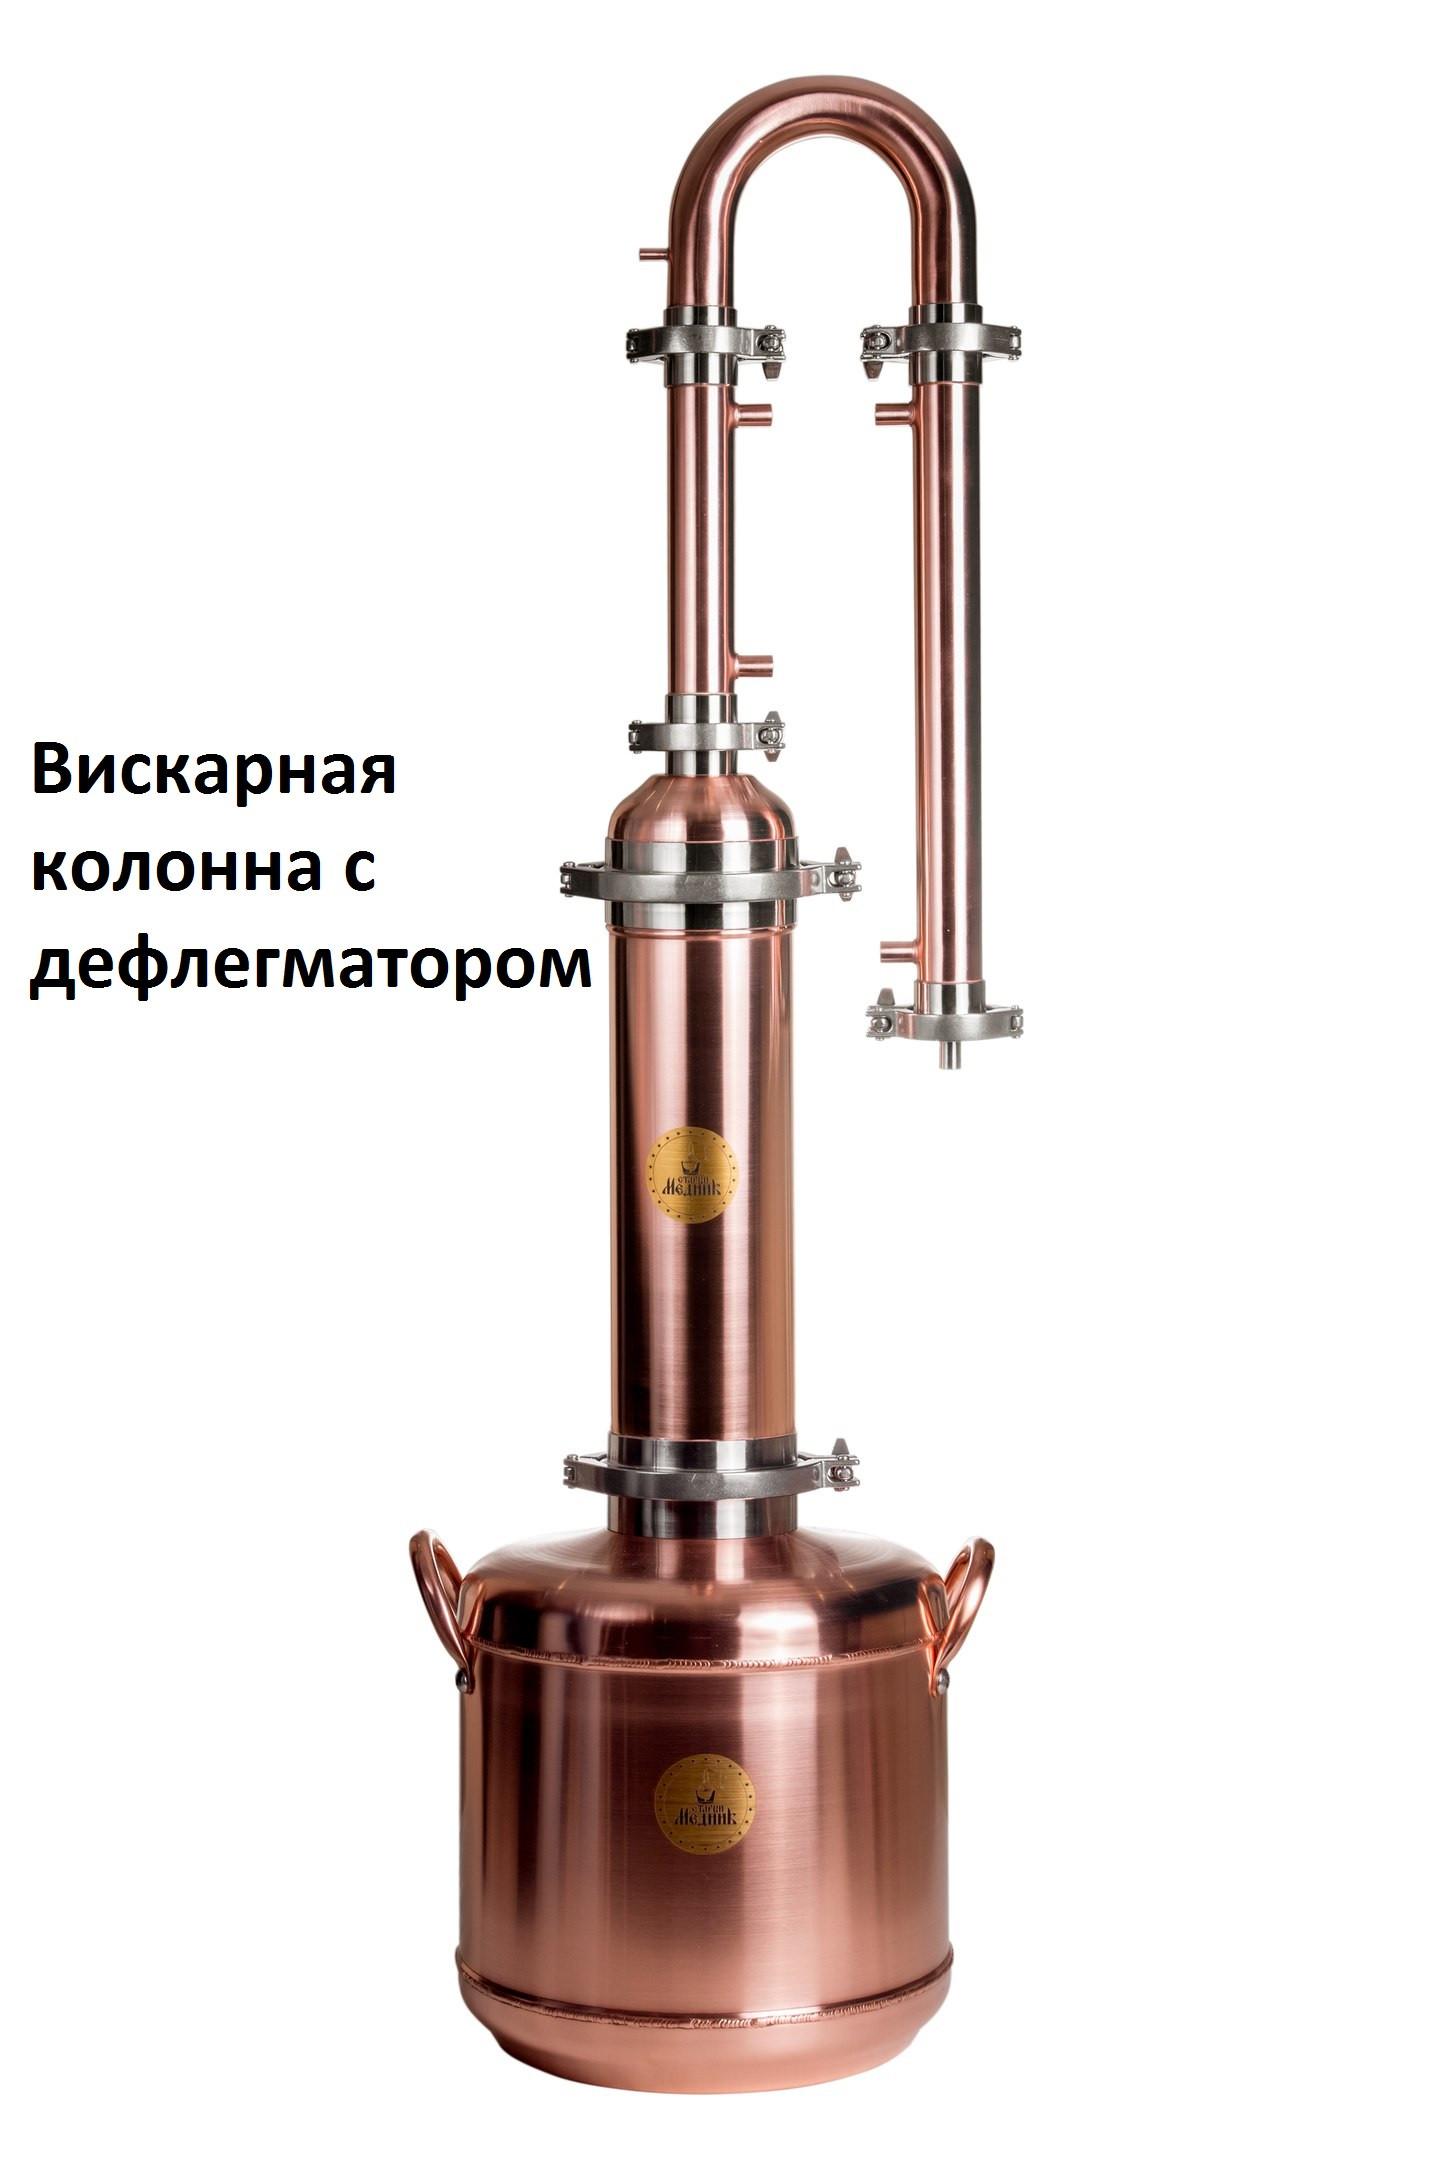 купить вискарная колонна с дефлегматором max cuprum